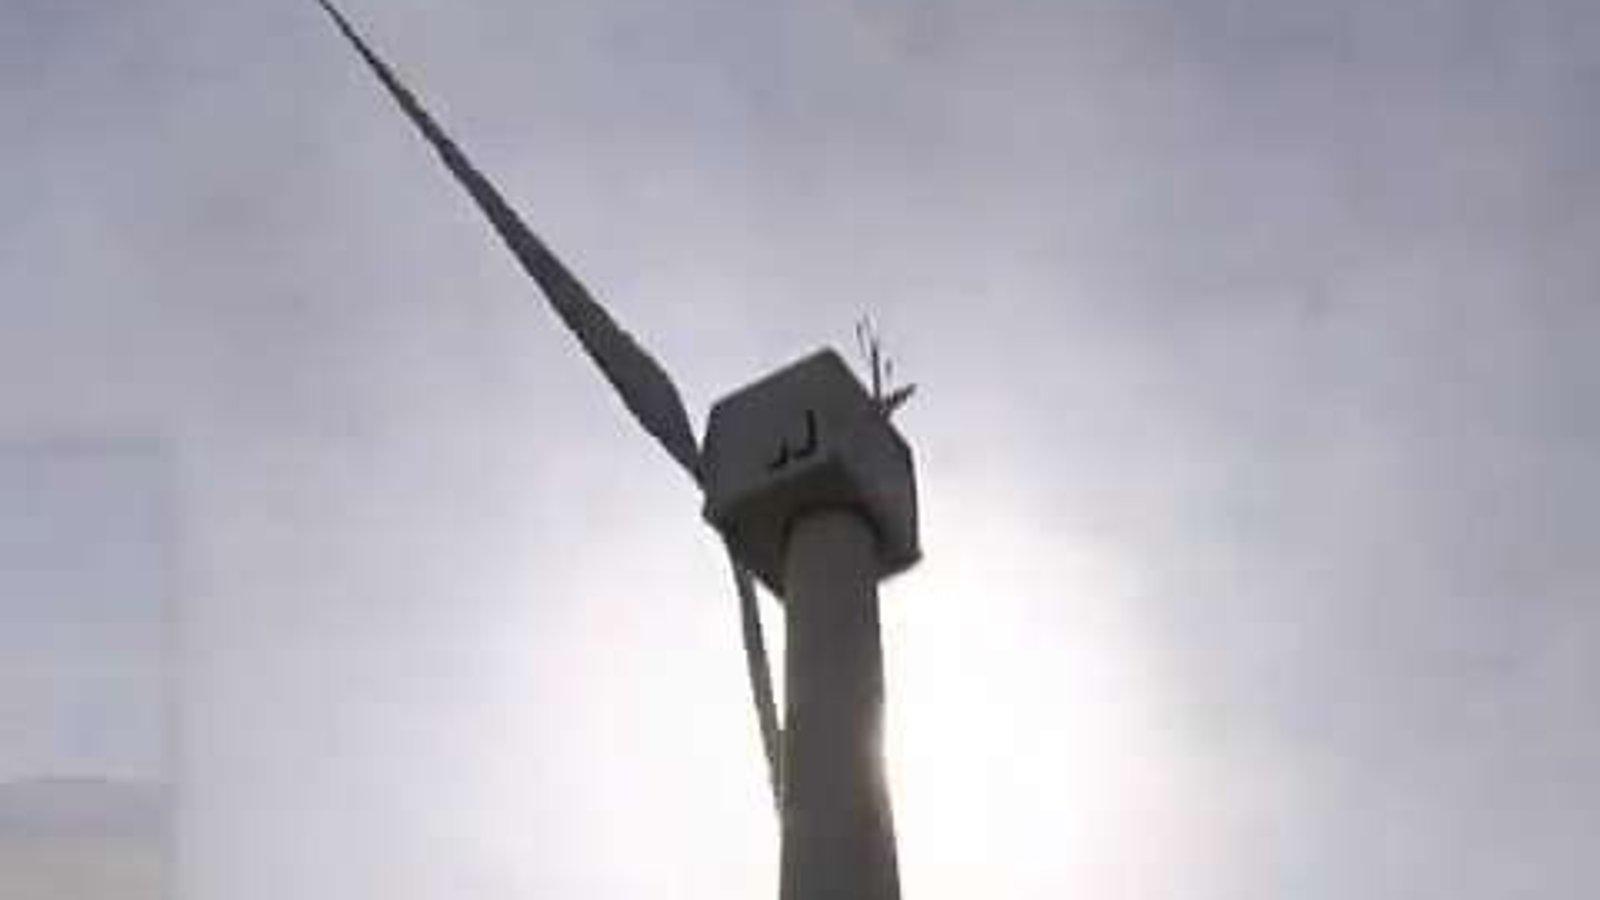 Wind Power - A Renewable Energy Source